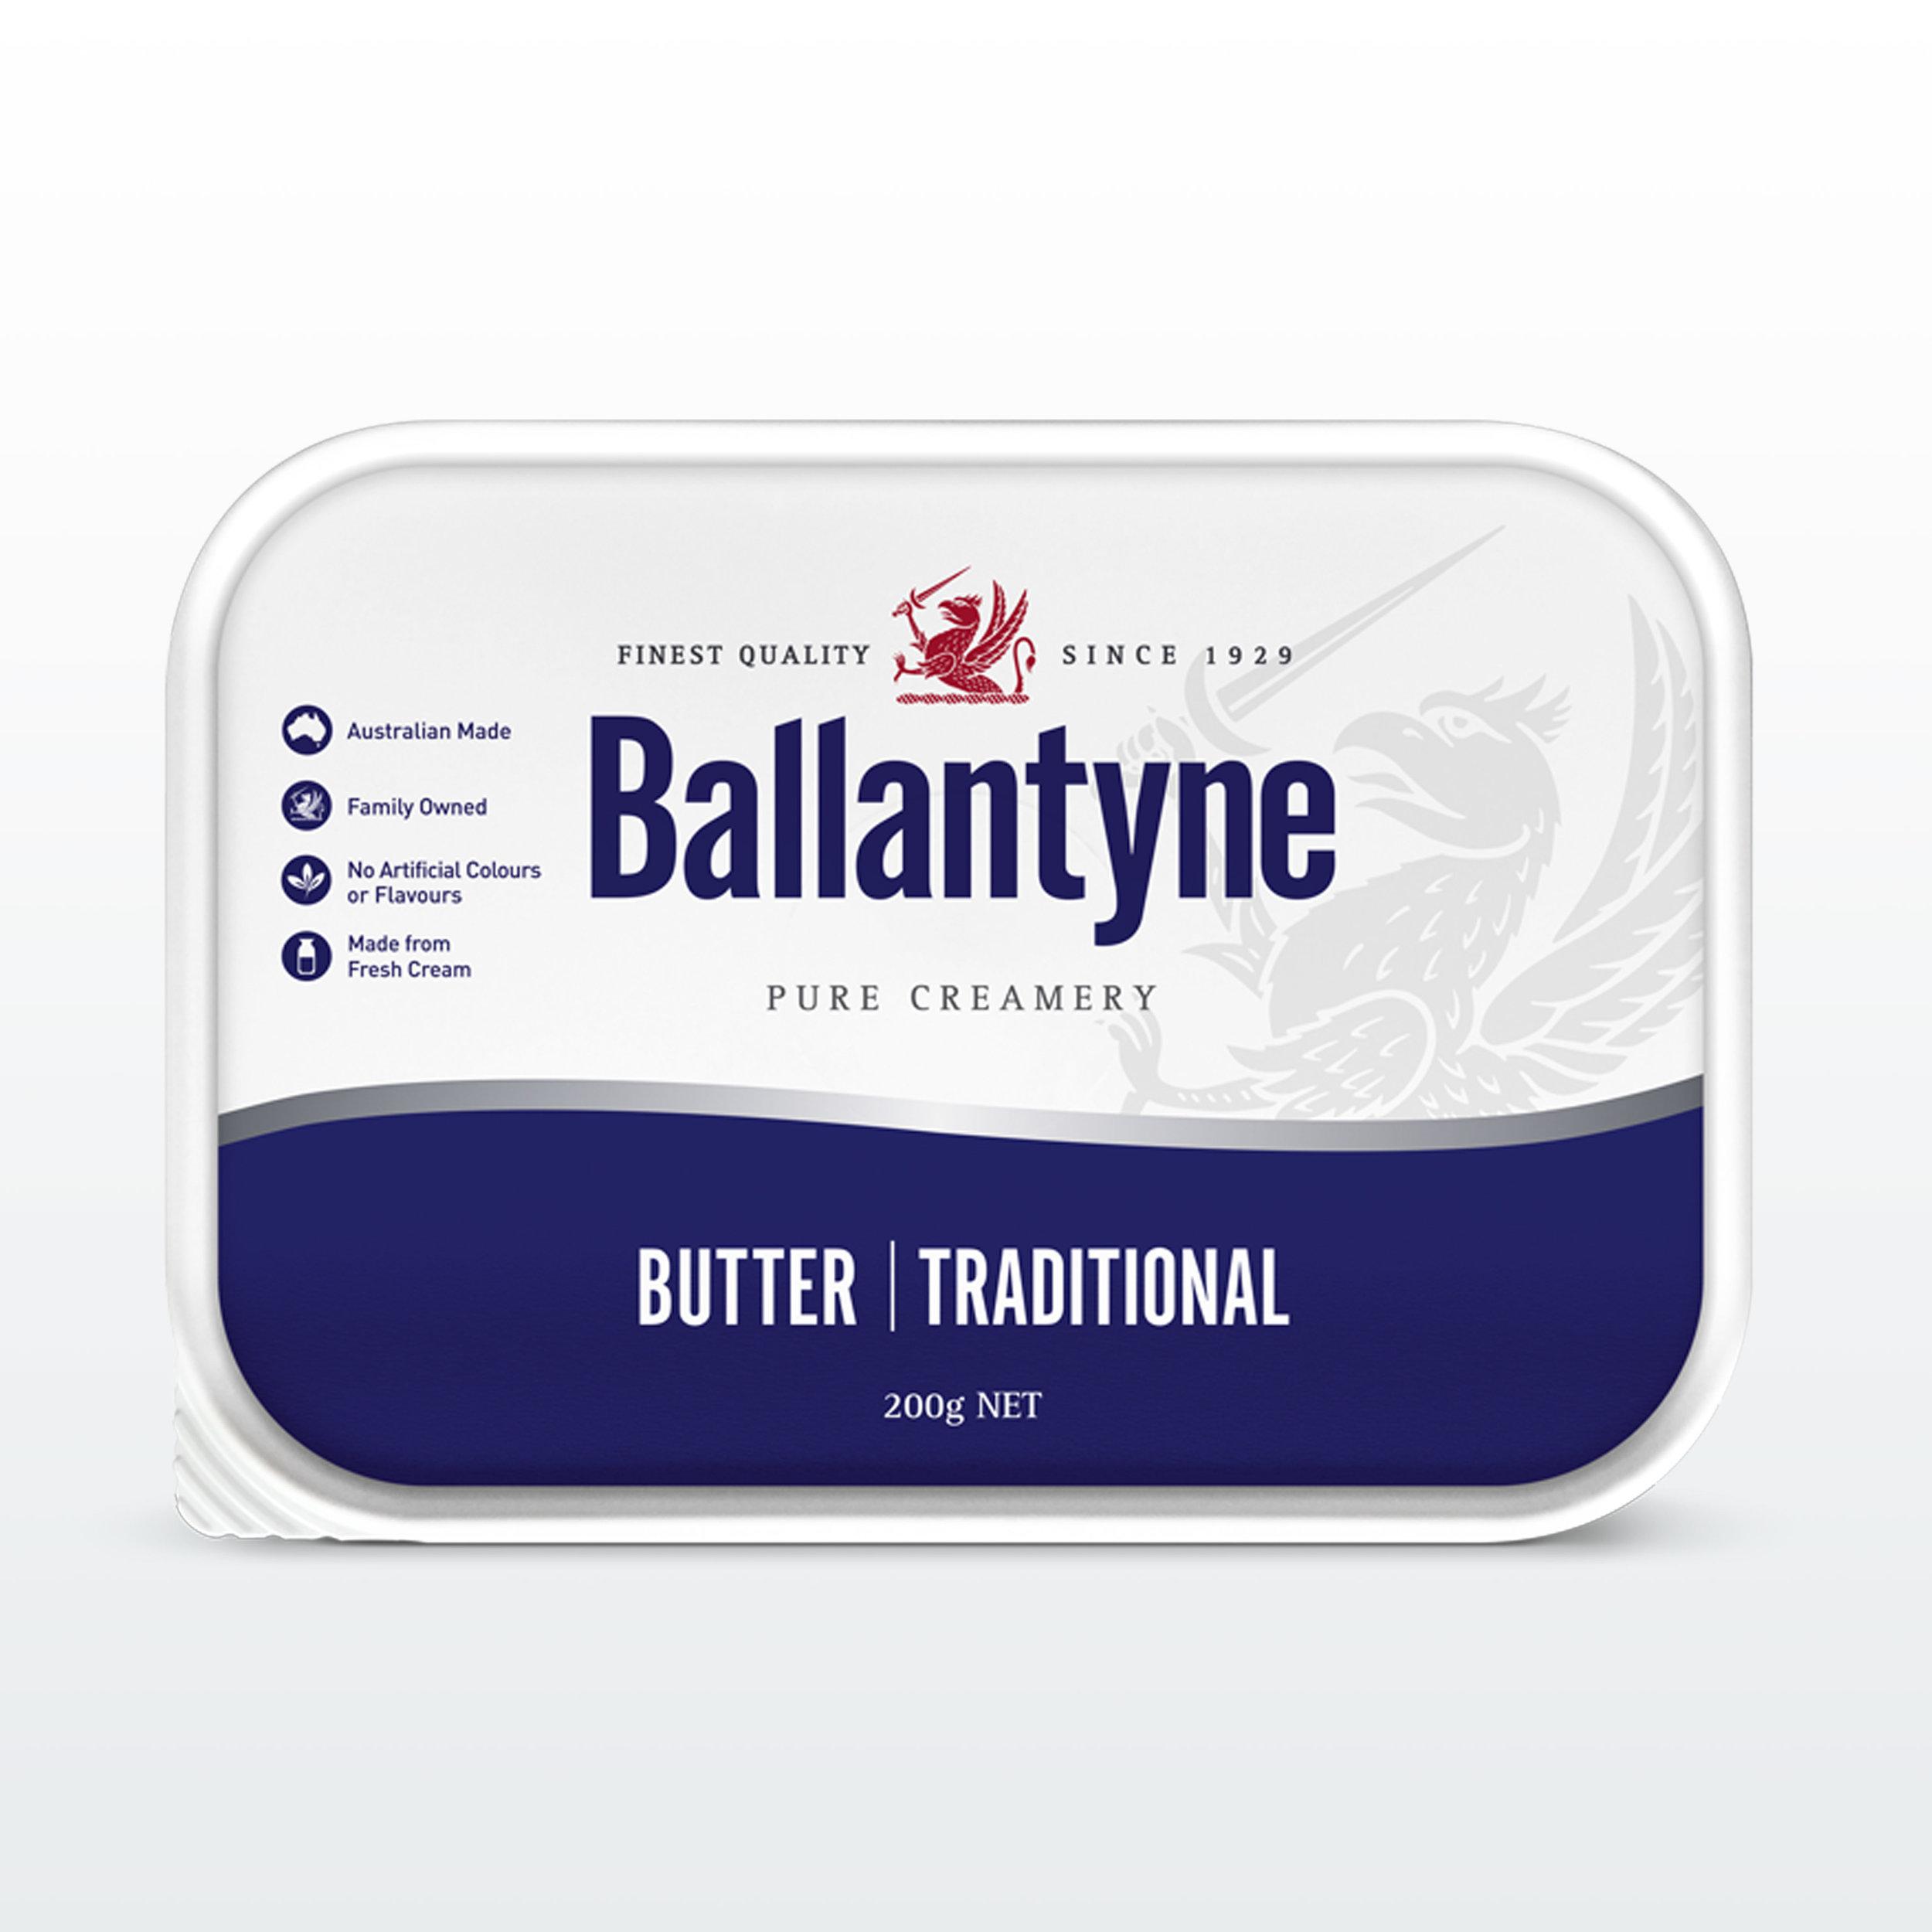 Ballantyne butter